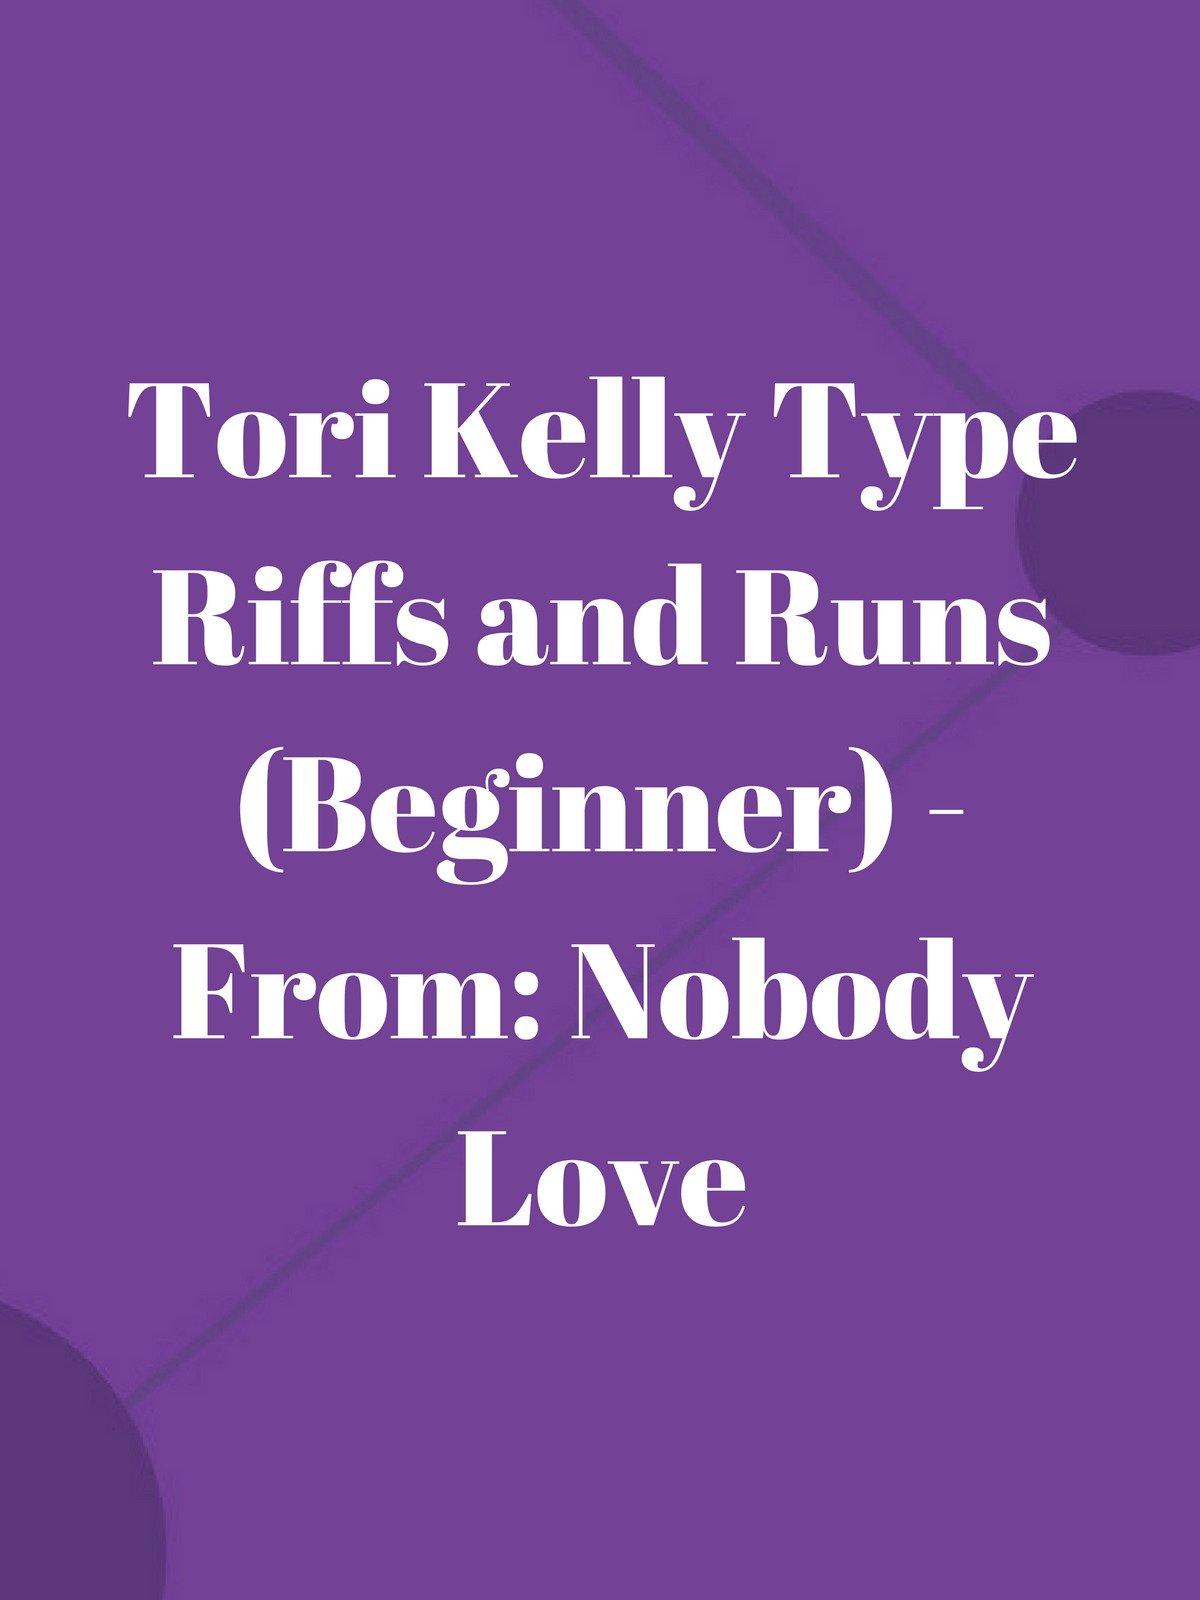 Tori Kelly Type Riffs and Runs (Beginner)